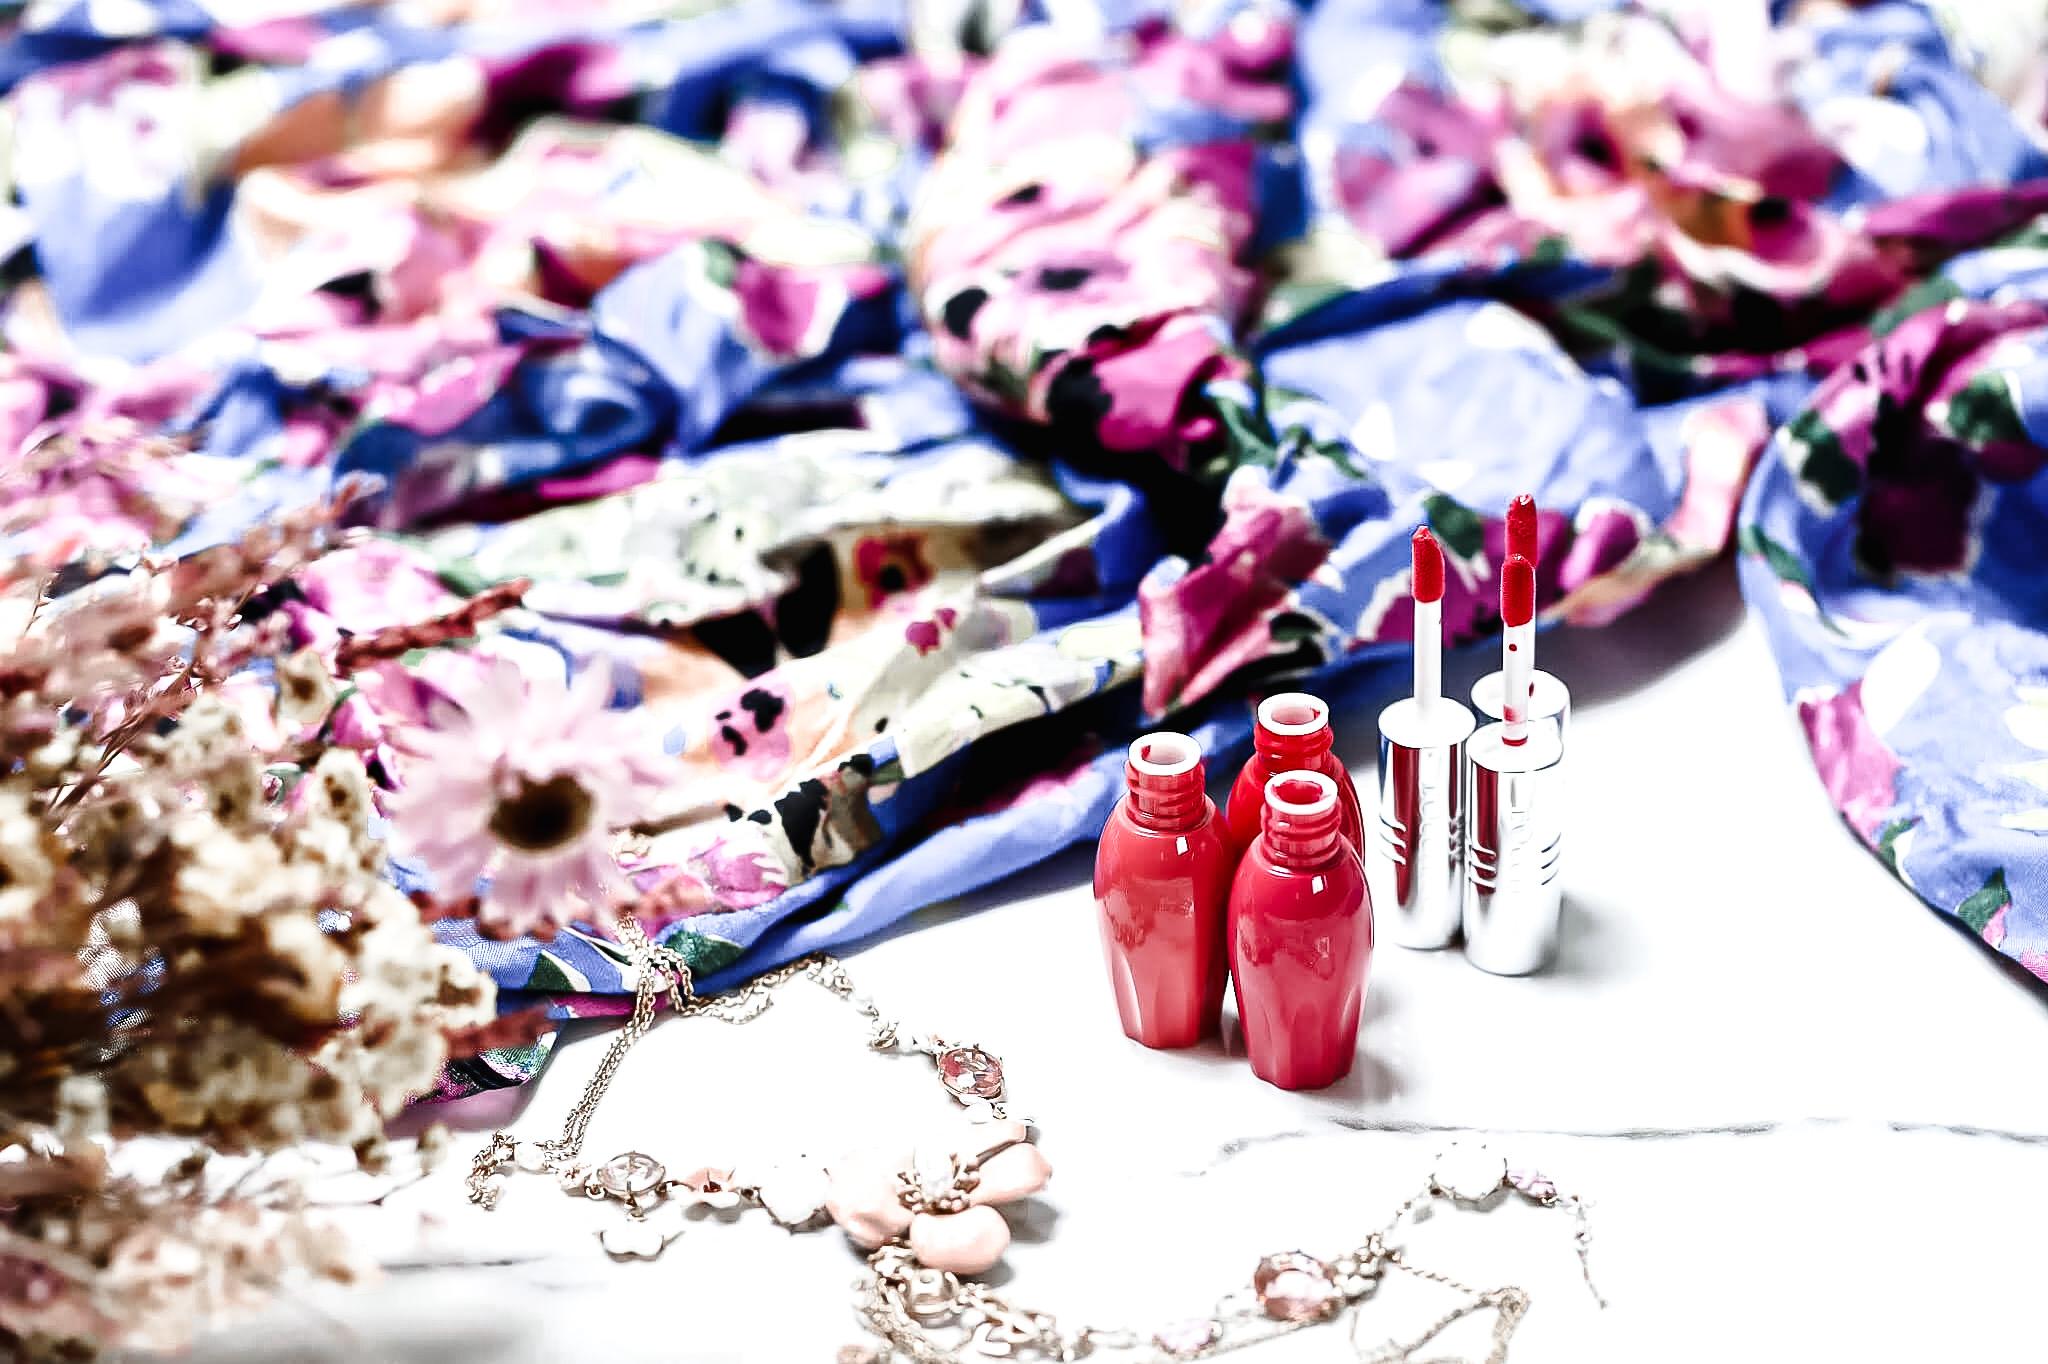 L'Occitane Rouge de Fruit 002 Carrose 003 Spring Sunrise 004 Pomelove